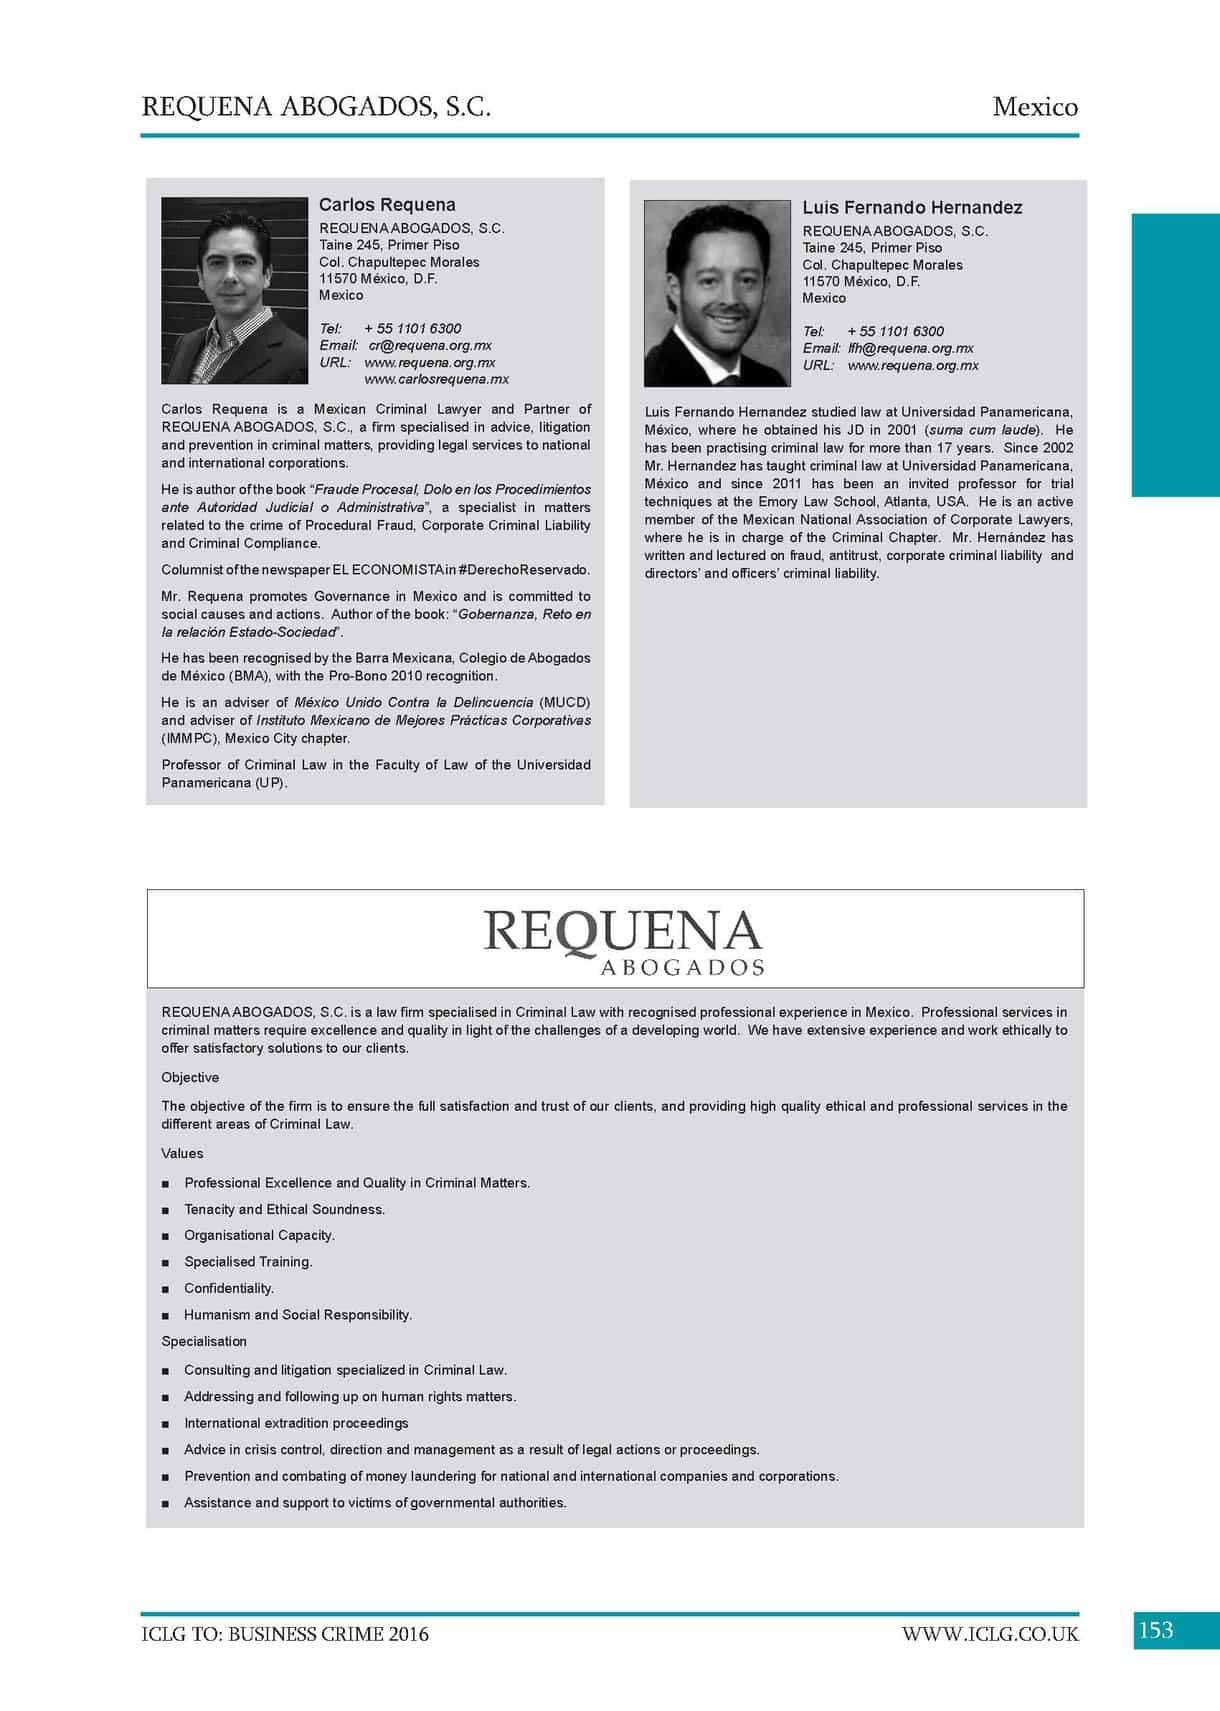 Carlos Requena | Abogado Penalista | 6th Edition Business Crime 2016